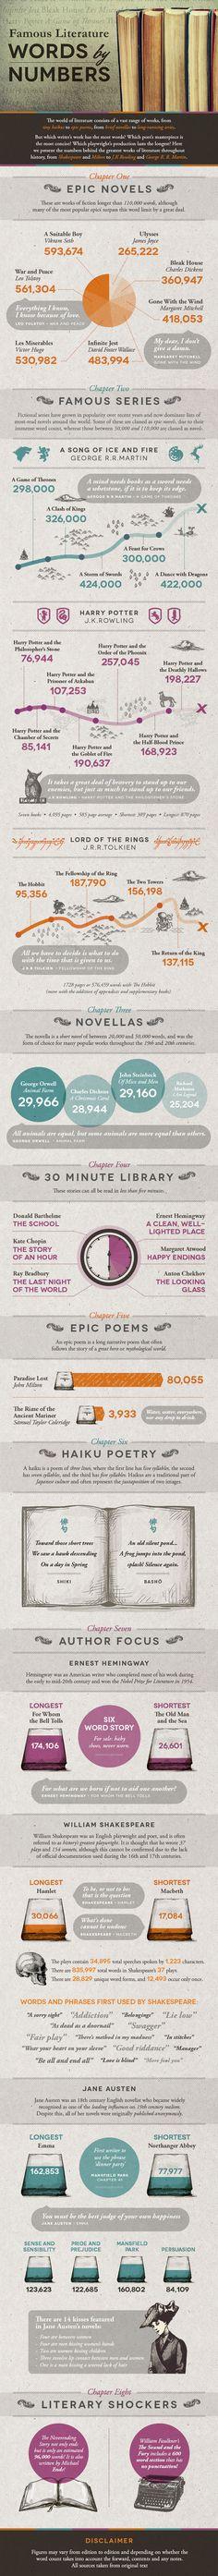 Literary Word Count Infographic - Books - ShortList Magazine